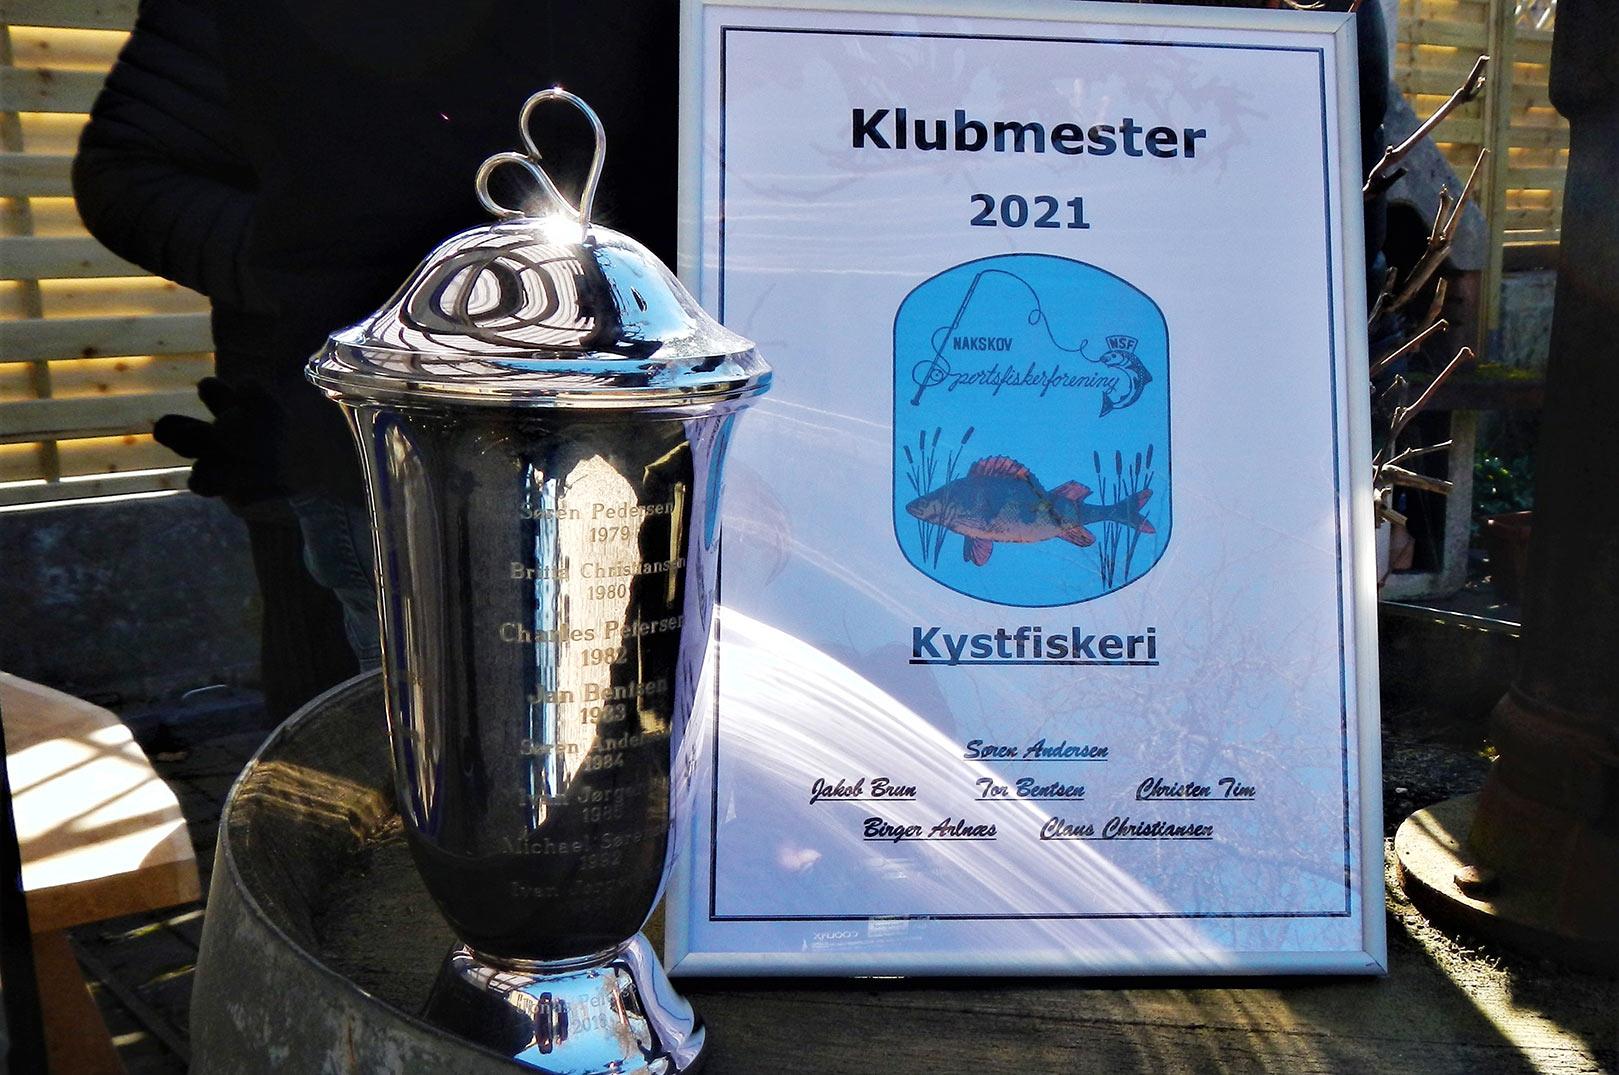 Claus Rysse Christiansen var vinder af Nakskov Sportsfisikerforenings klubmesterskab i kystfiskeri.